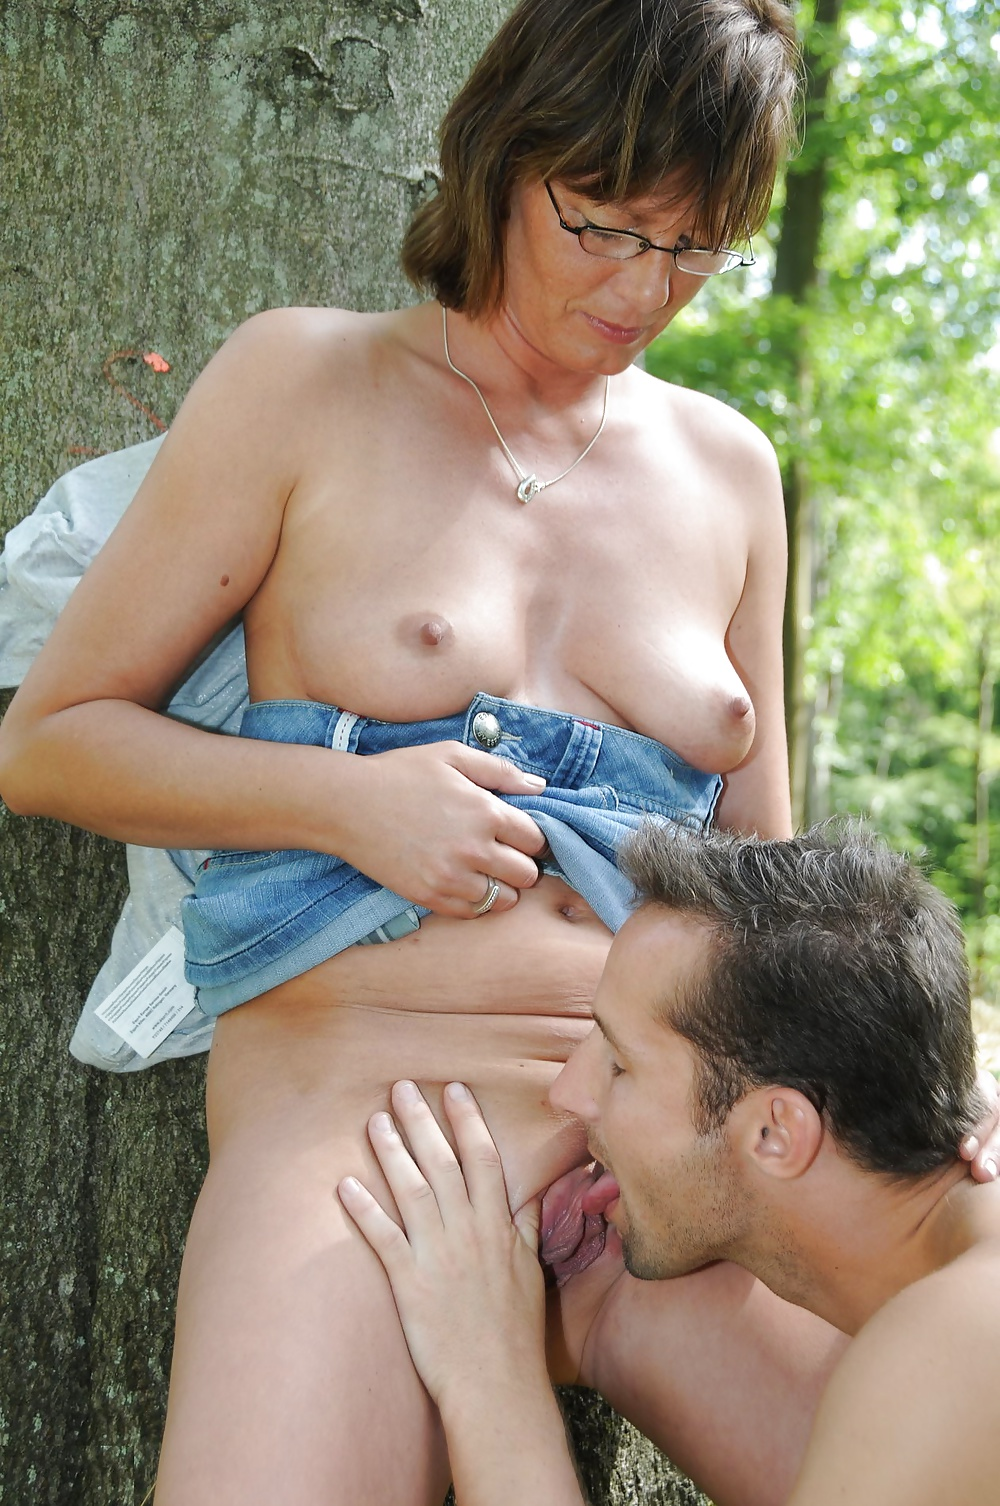 члена секс видео русские мамочки секс на улице знаю что